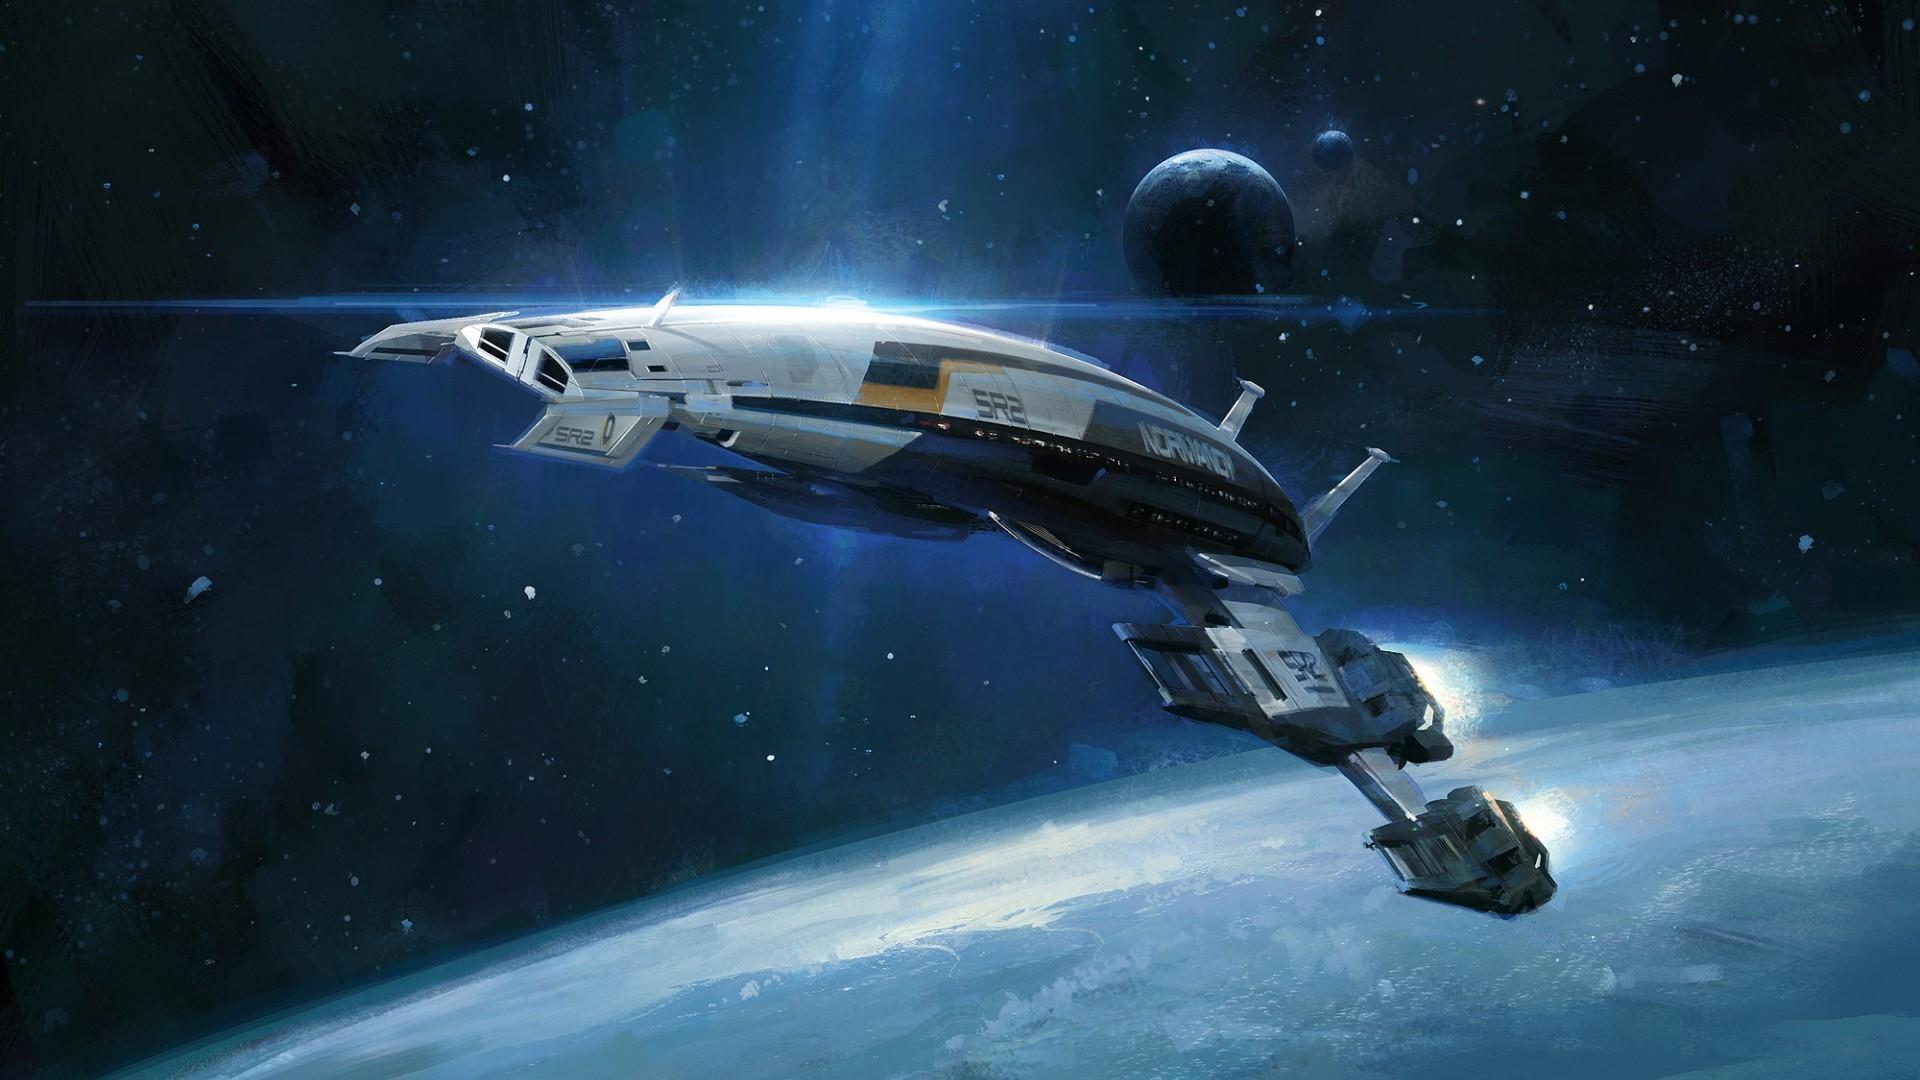 Space Concept Art Normandy Ship HD Desktop Wallpaper Hd Space wallpapers  download